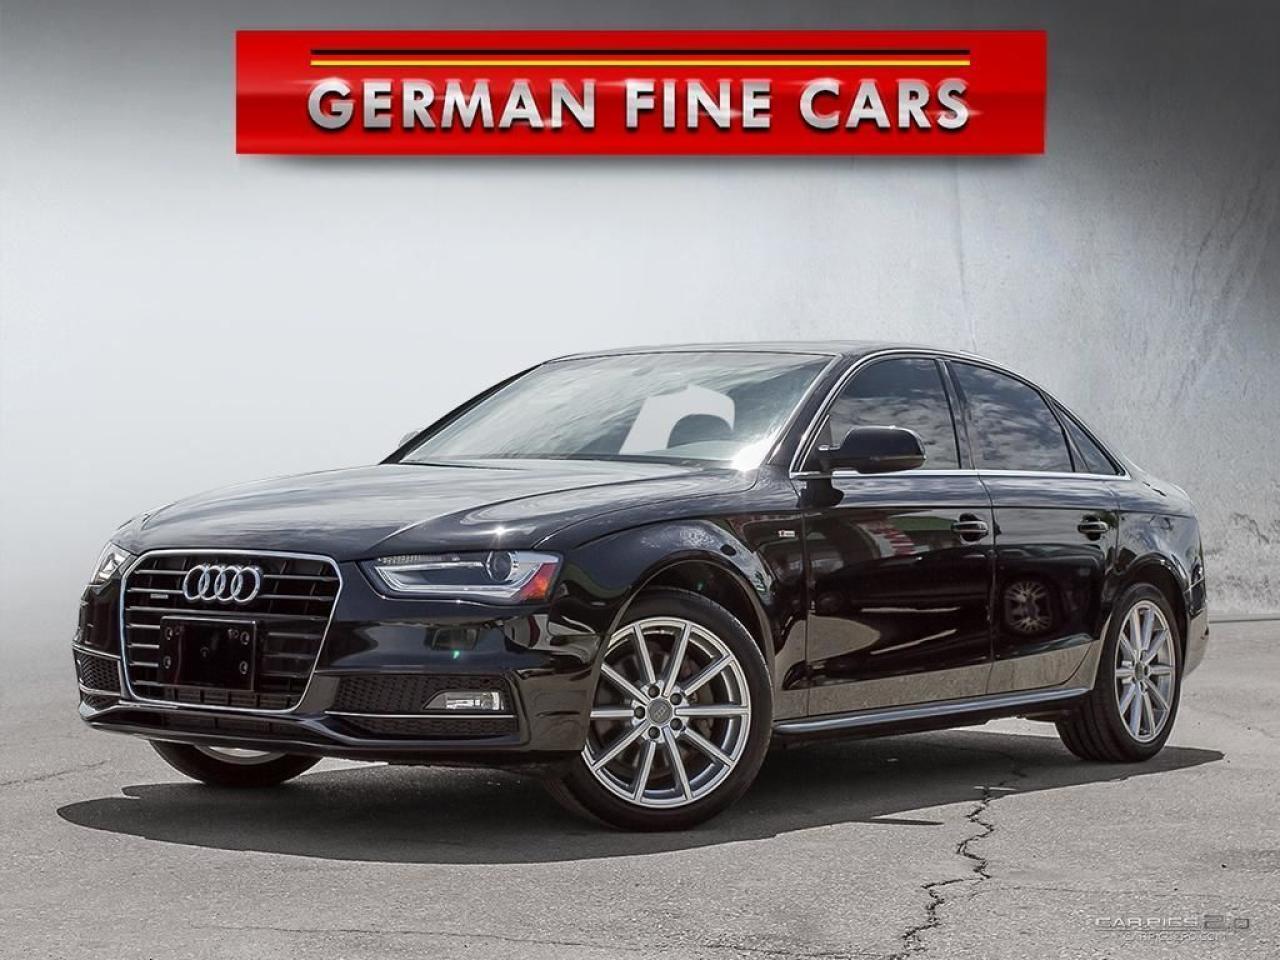 2015 Audi A4 2.0T SLINE QUATTRO*PROGRESSIVE PLUS, NAVIGATION*